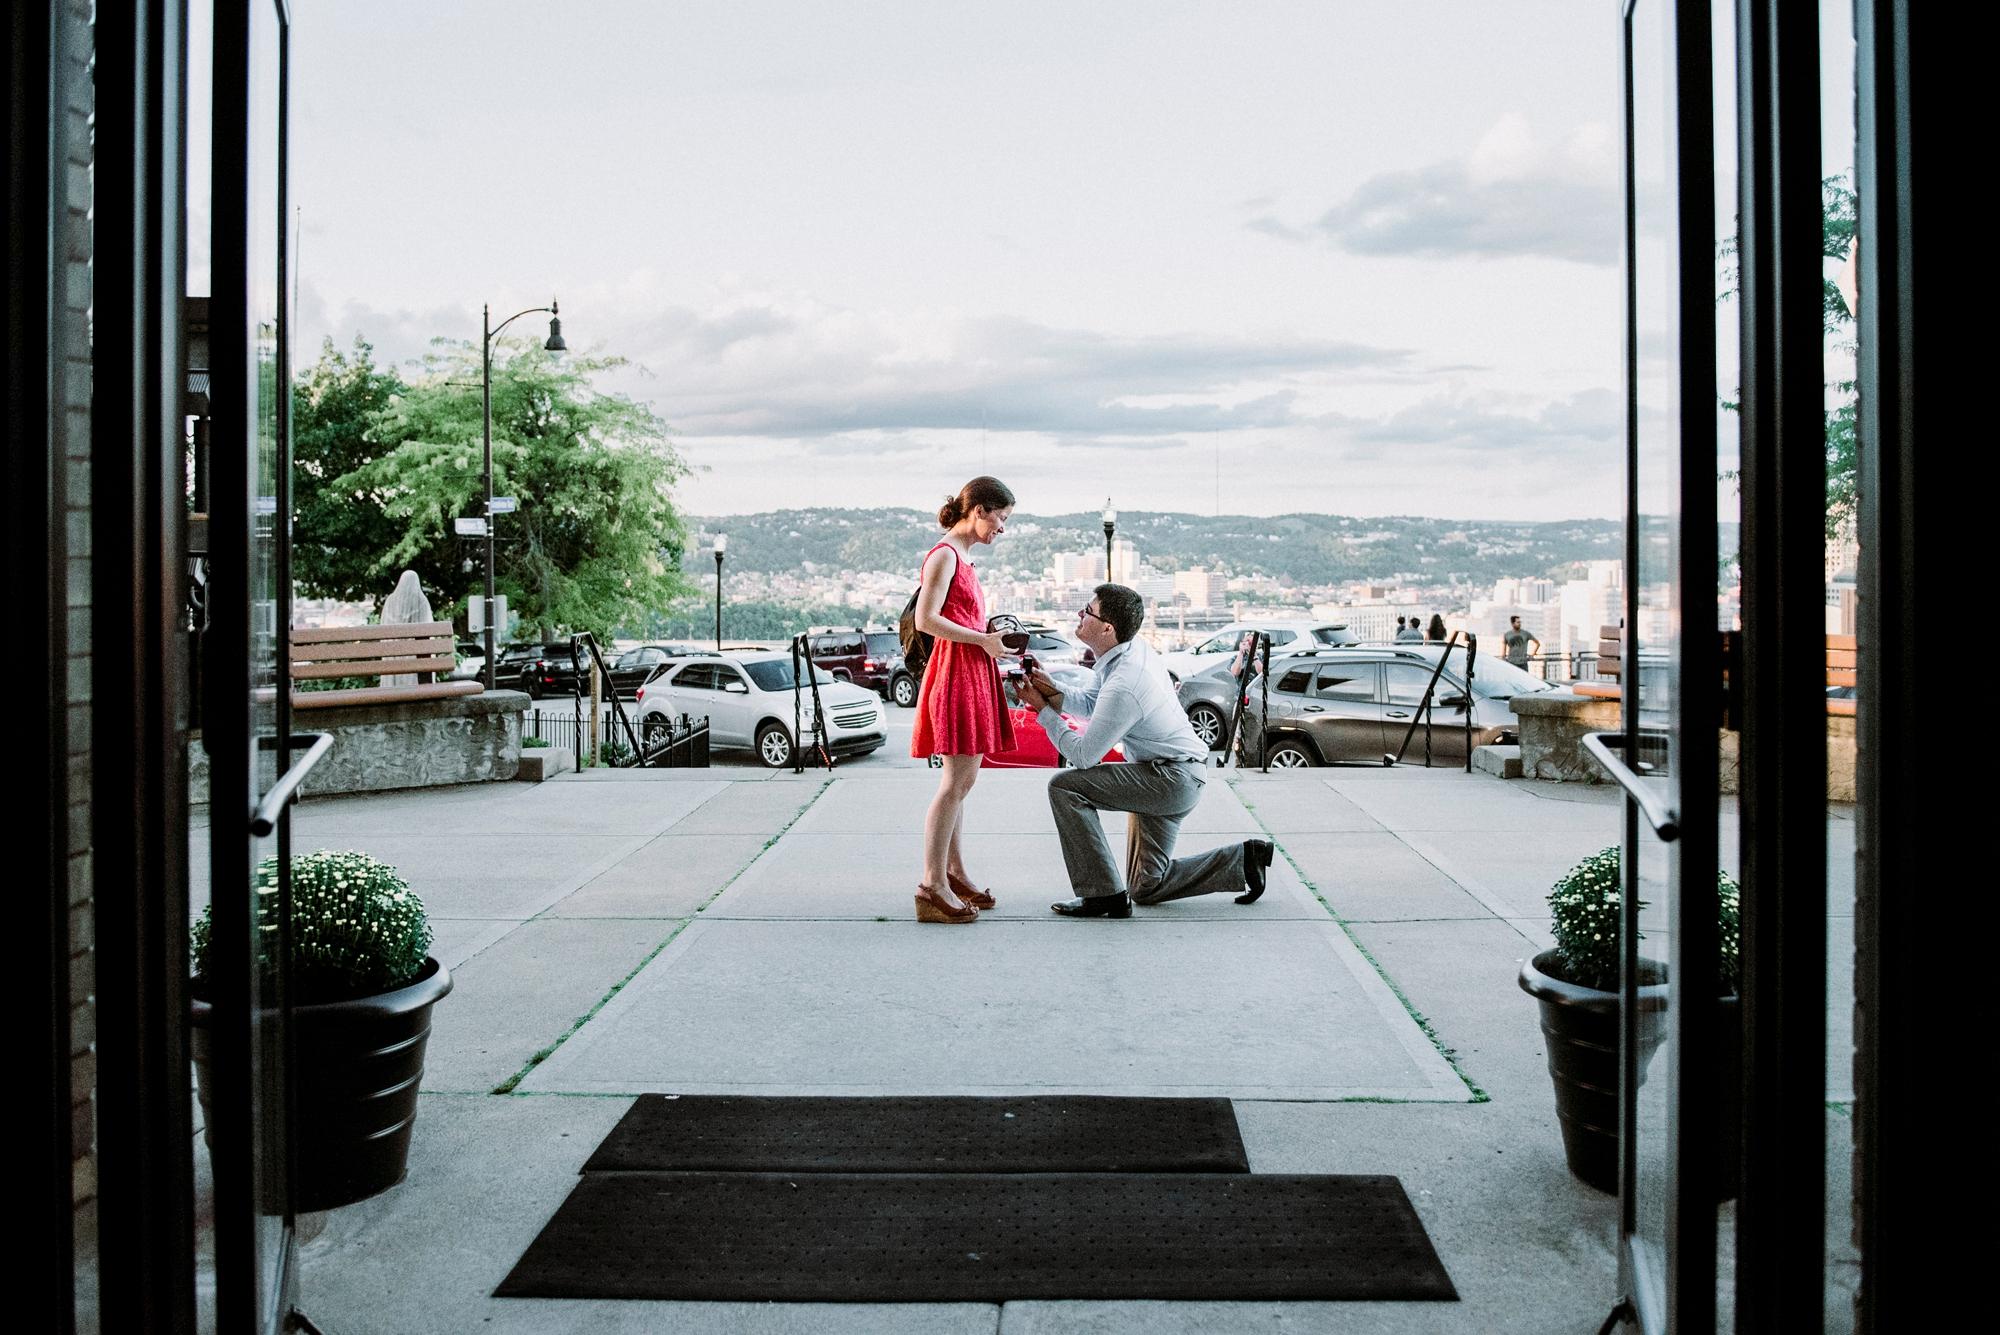 0124Jorge-Clara-Proposal-Pittsburgh_Proposal-Pittsburgh-Constructed-Adventures-Sandrachile.jpg